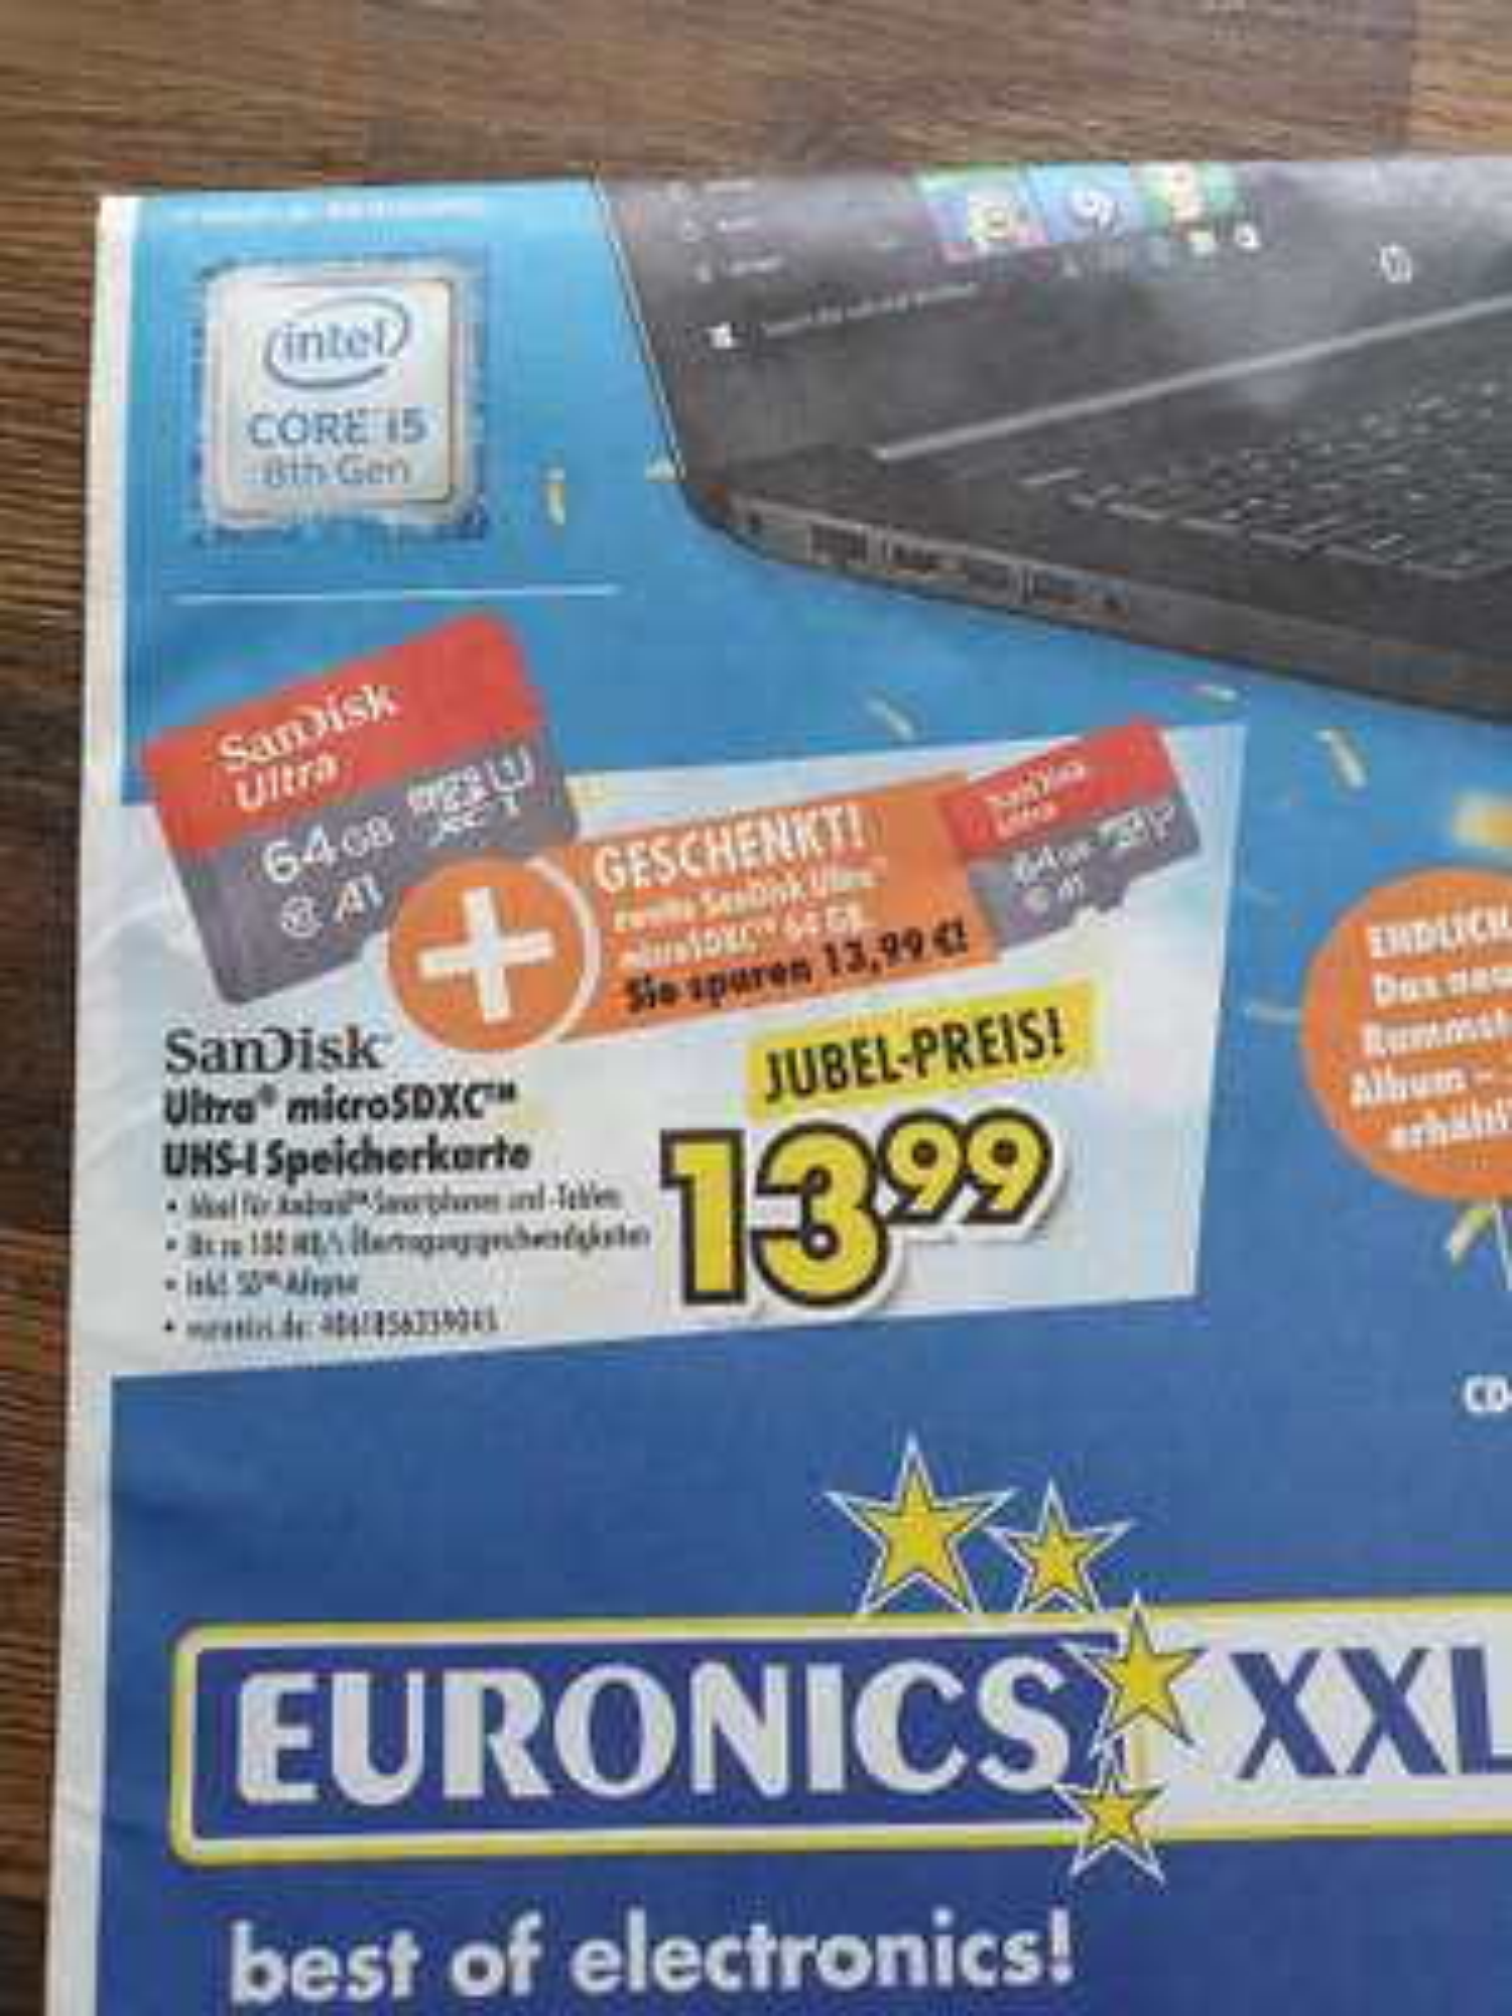 2x SANDISK Ultra 64GB microSDXC Speicherkarte (lokal) [Euronics]